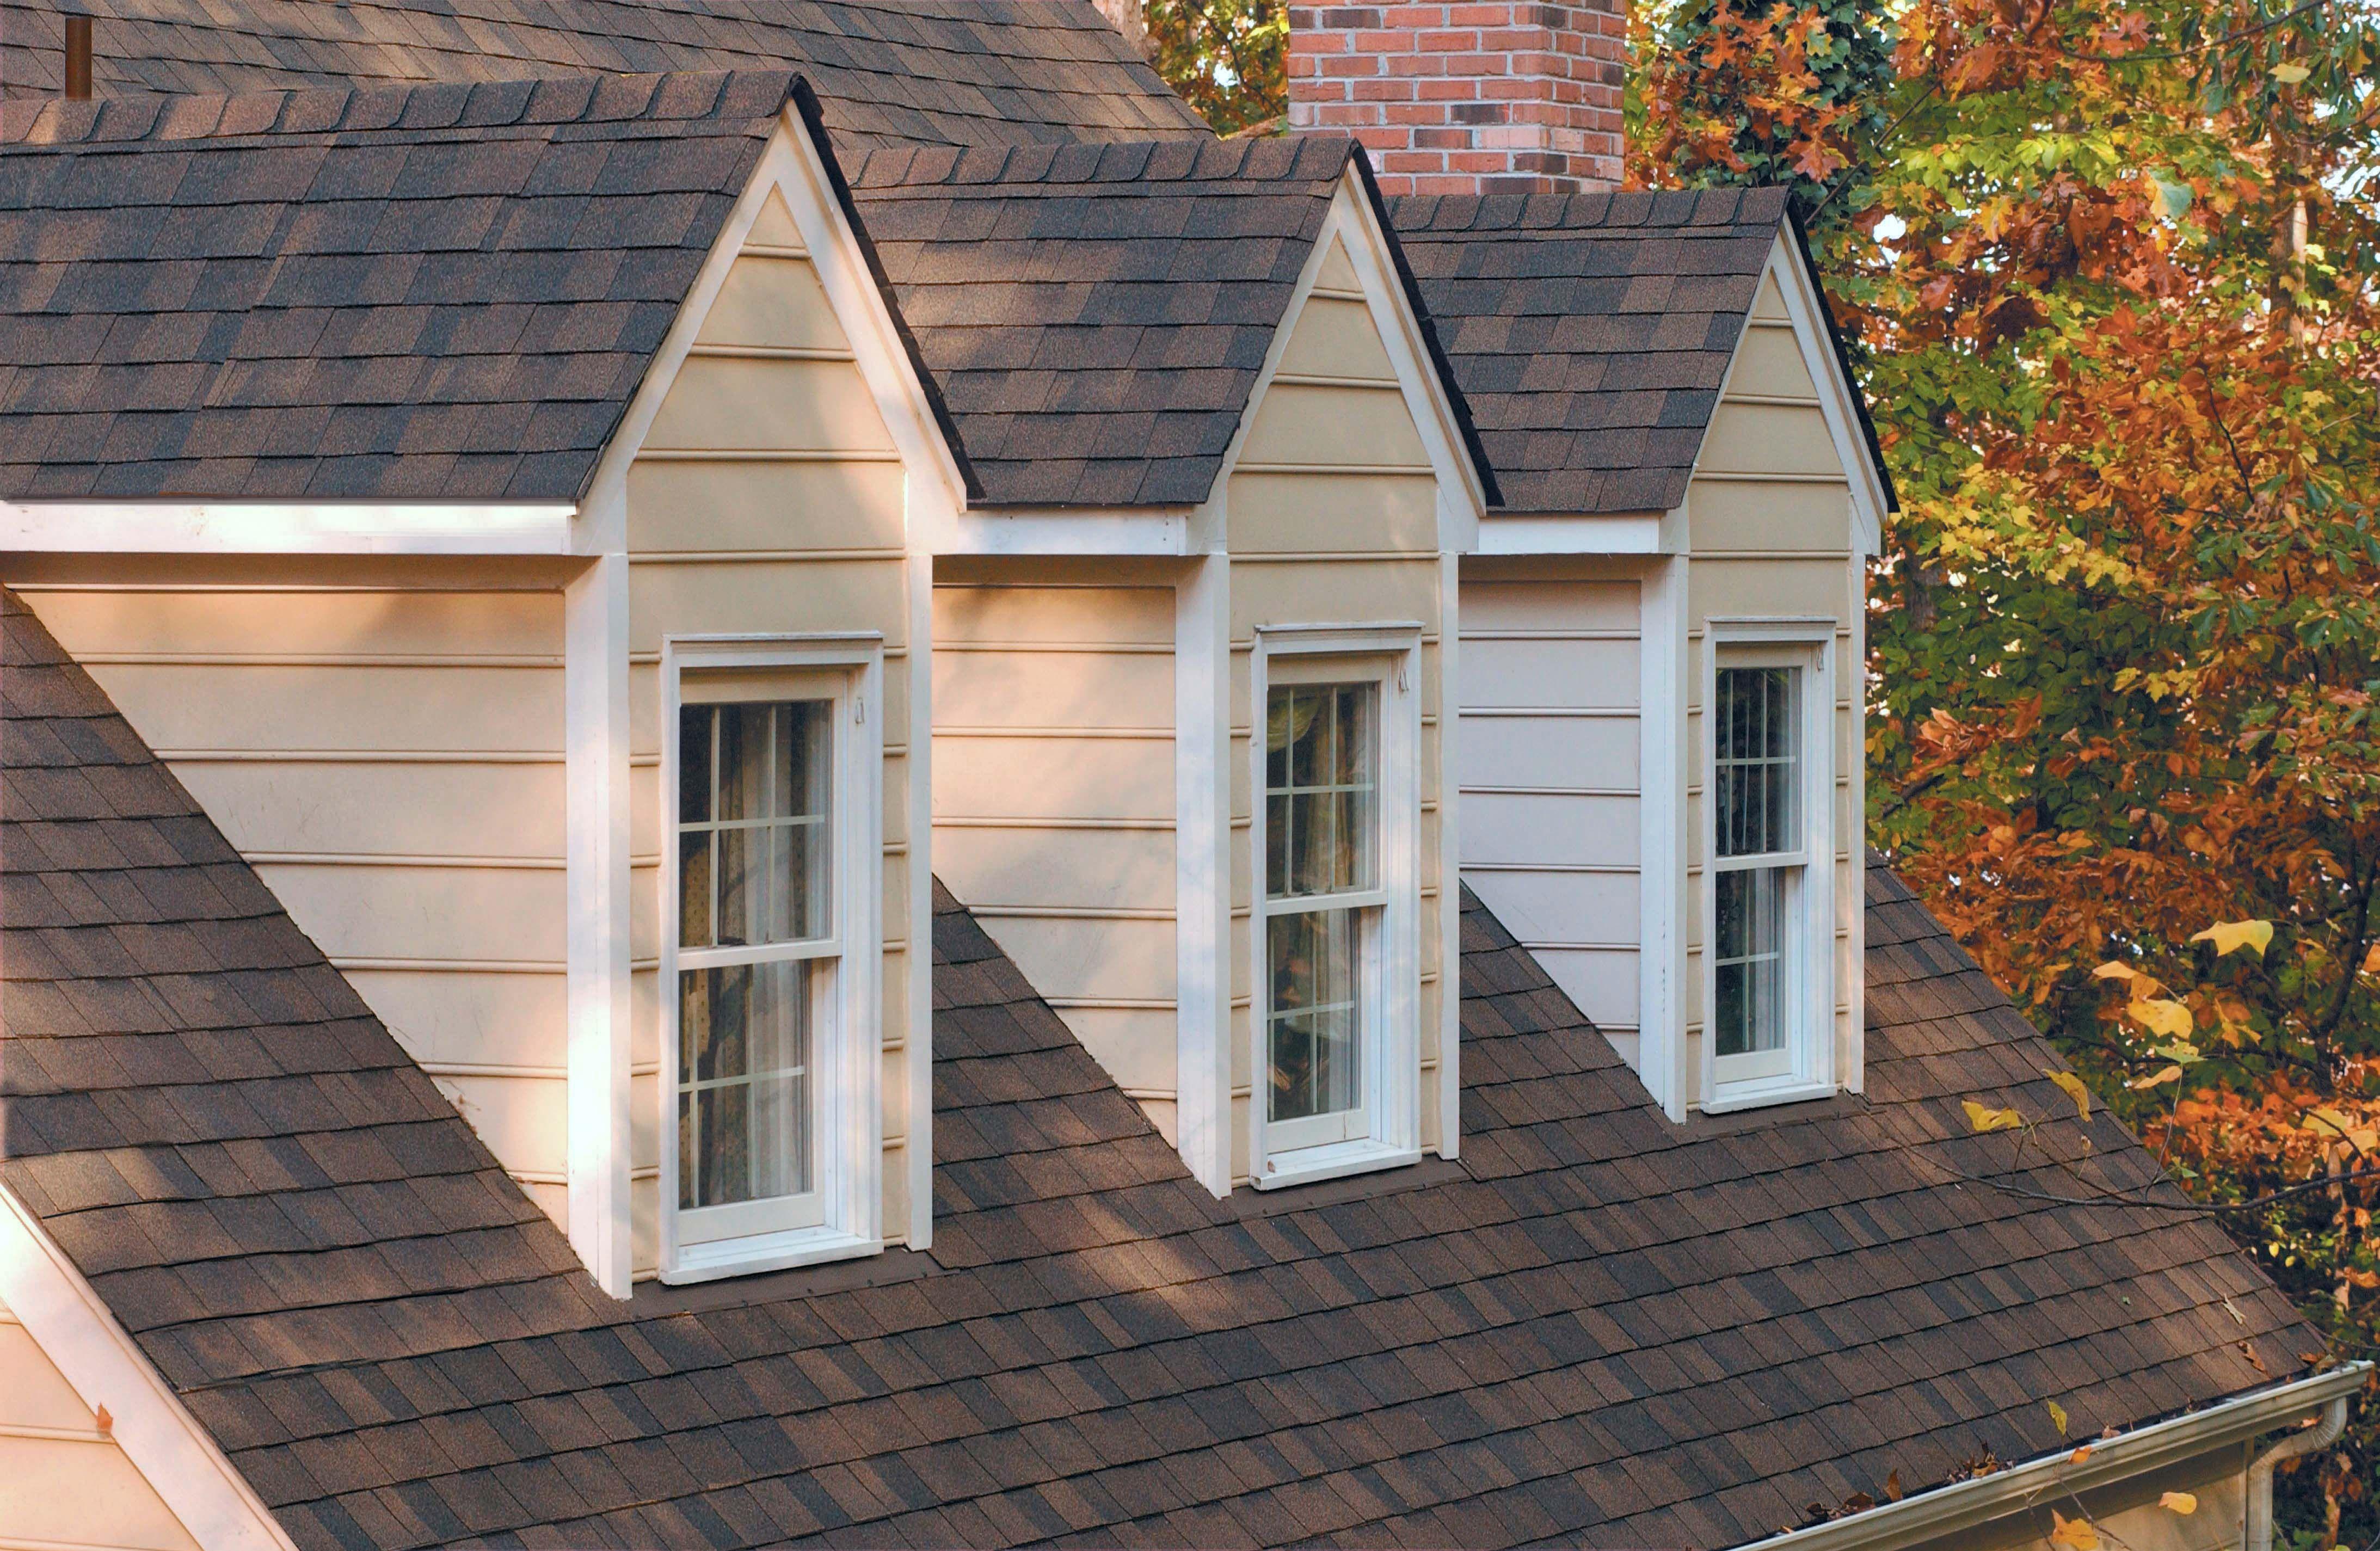 Landmark Burnt Sienna Roofing Certainteed Roof Colors